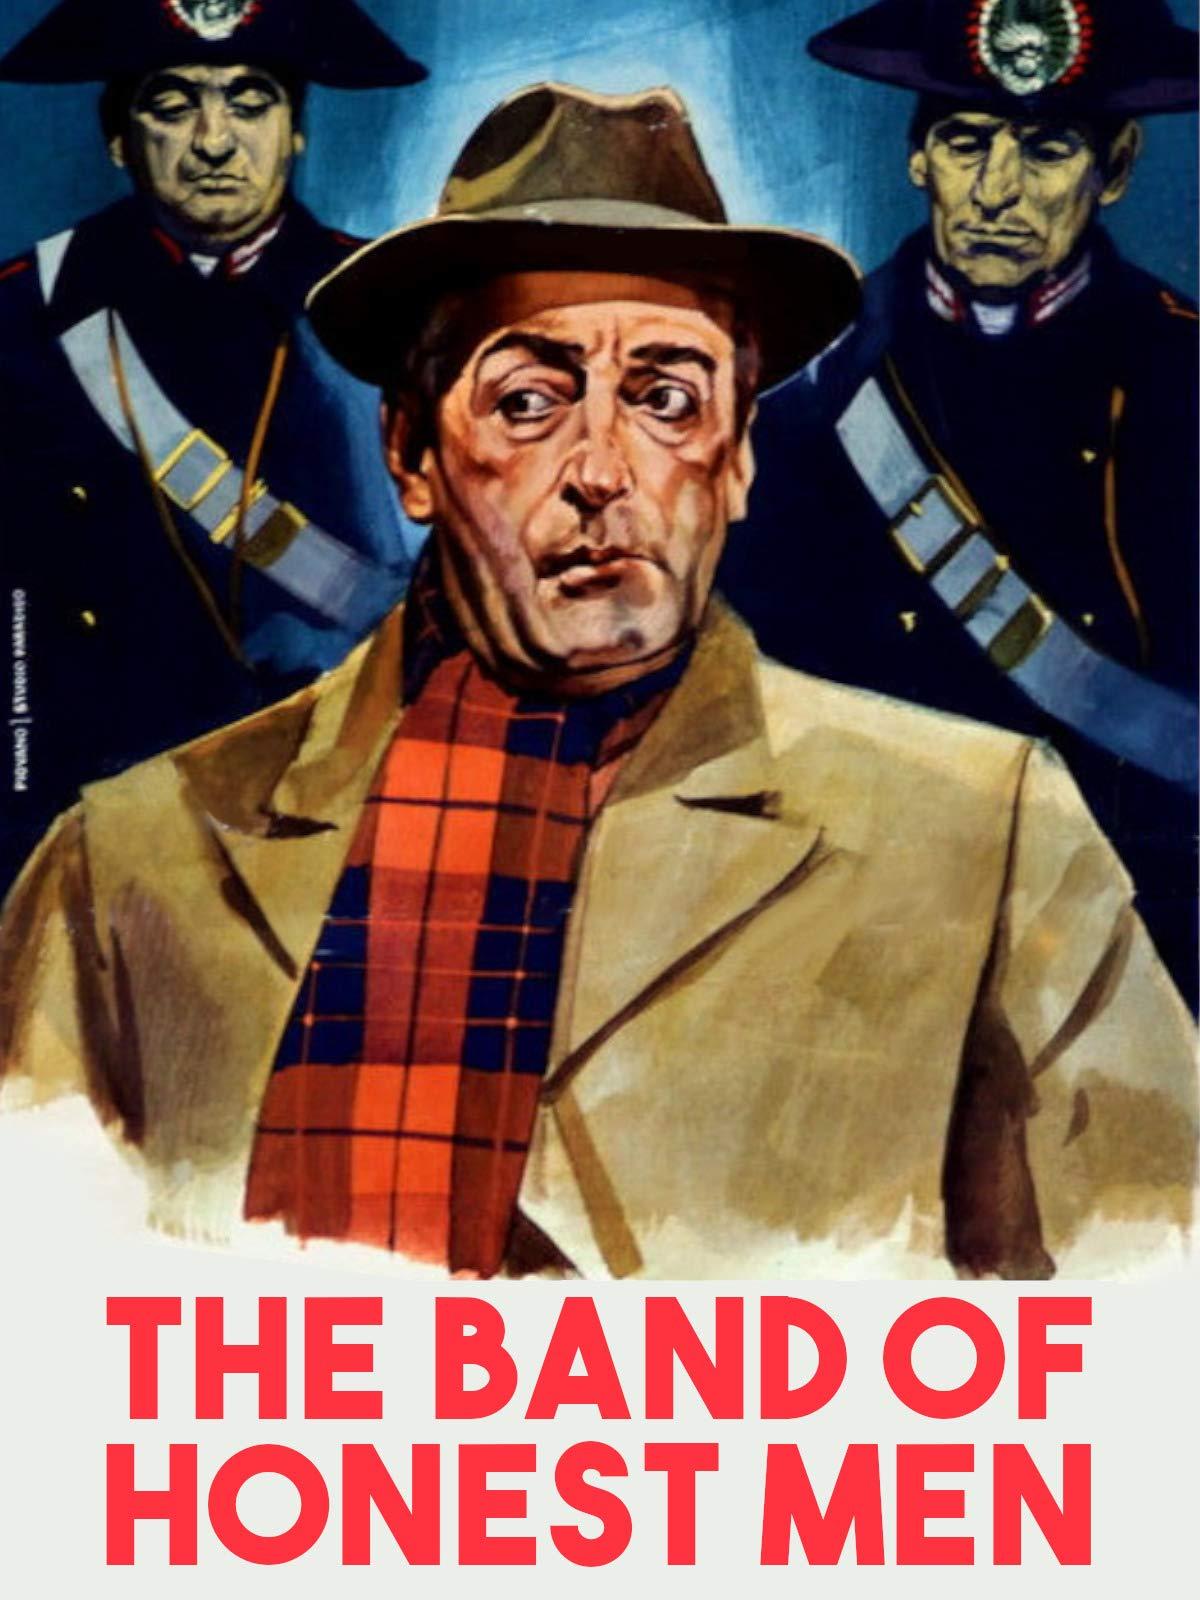 The Band of Honest Men